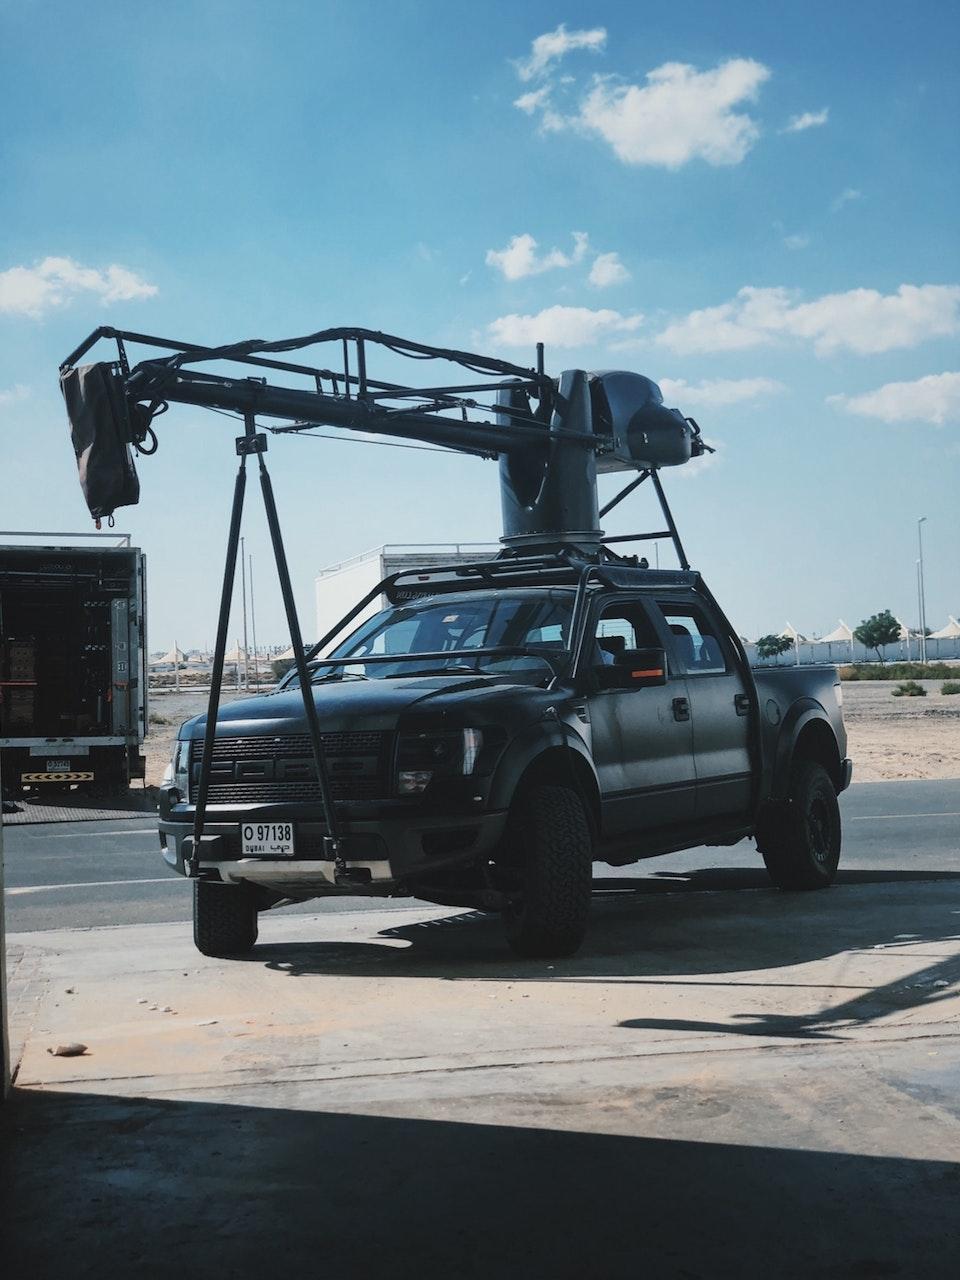 electriclimefilms - Porsche 'Machines'